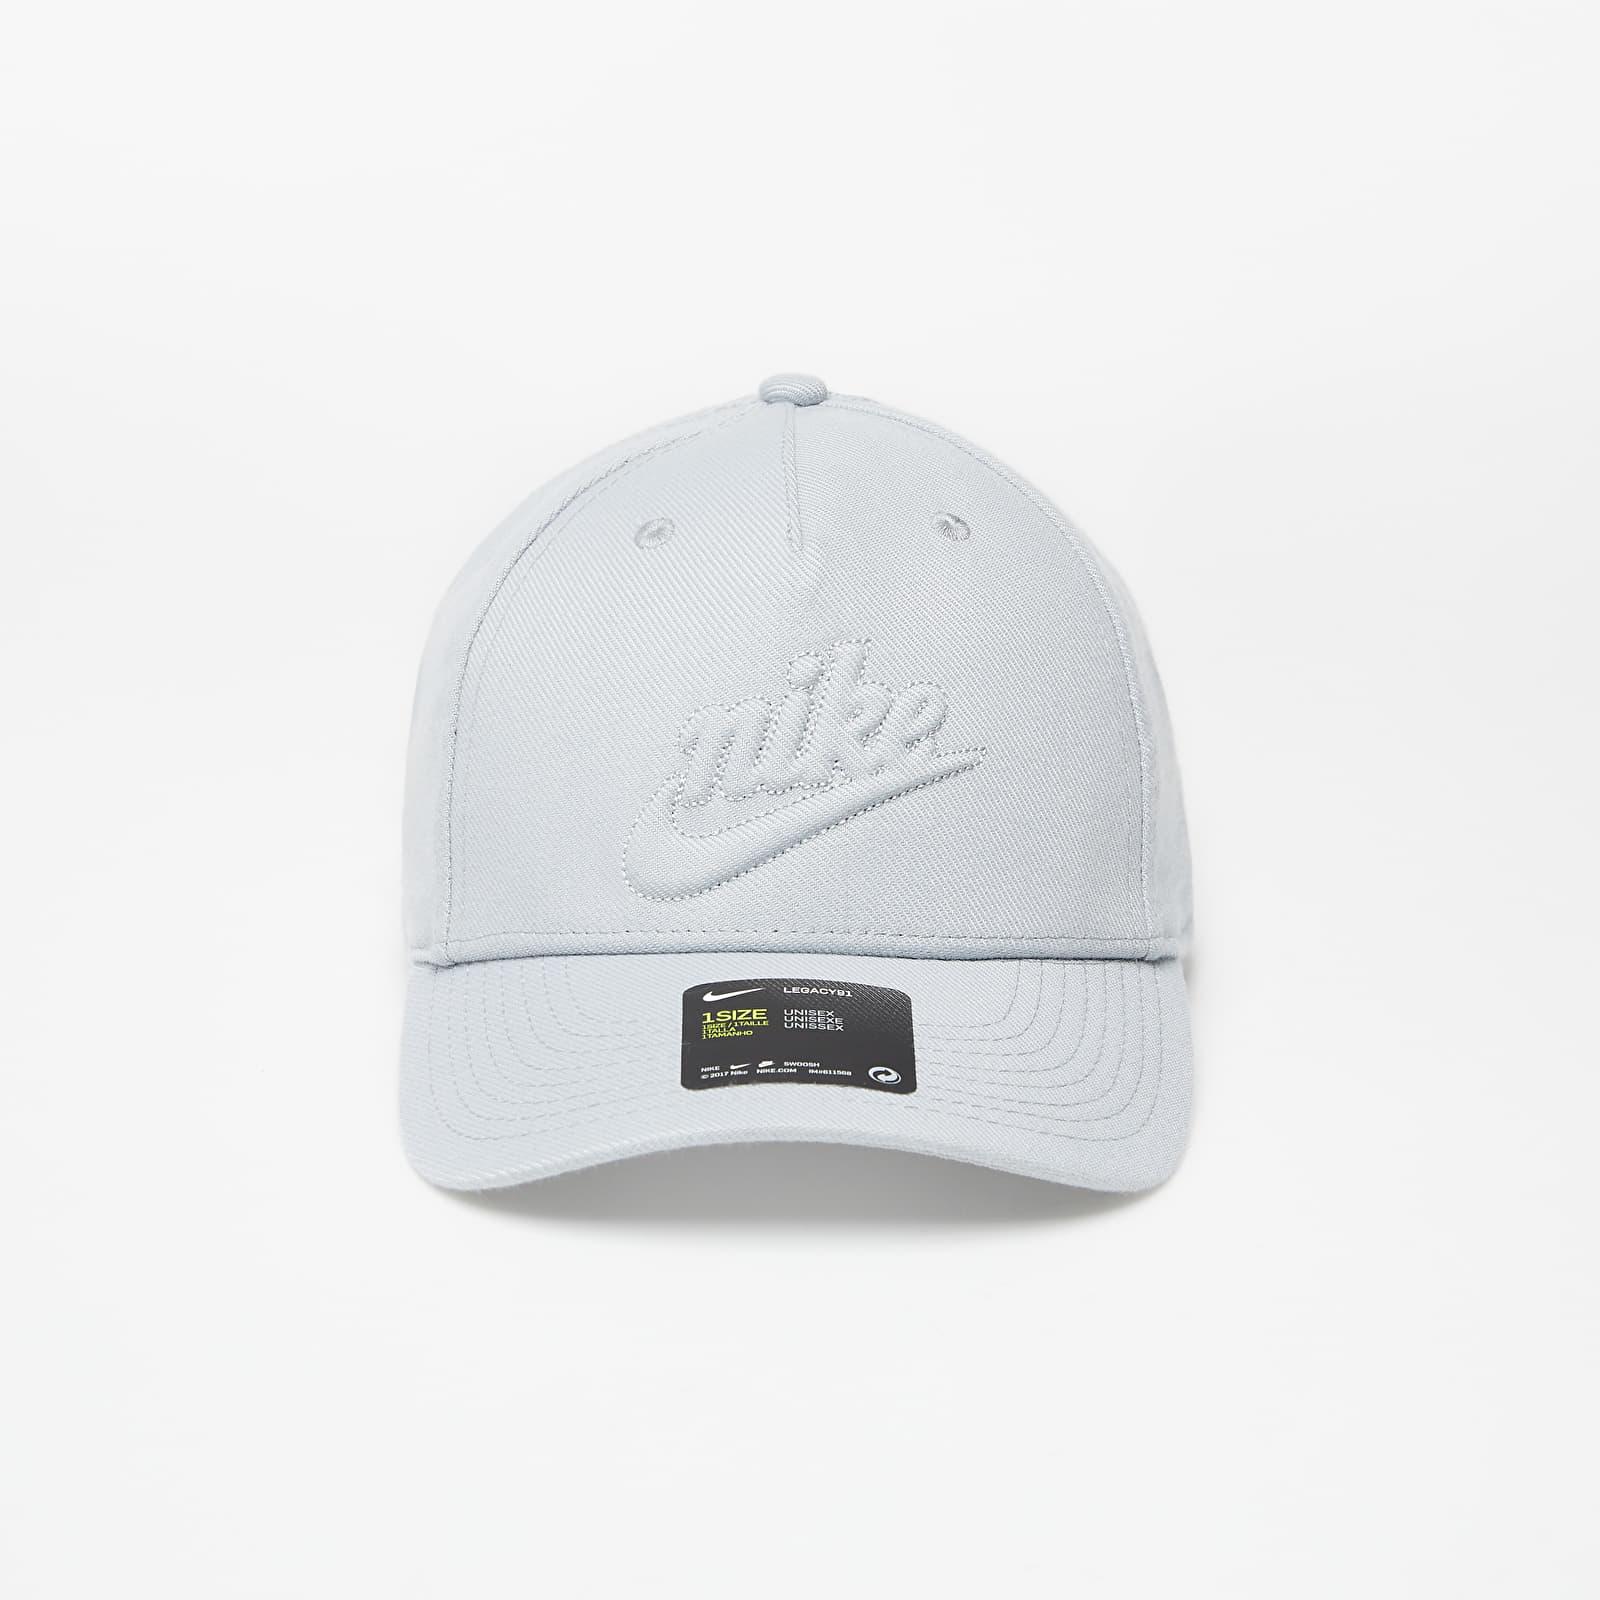 Caps Nike Sportswear L91 Cap Futura Hrtg Lt Smoke Grey